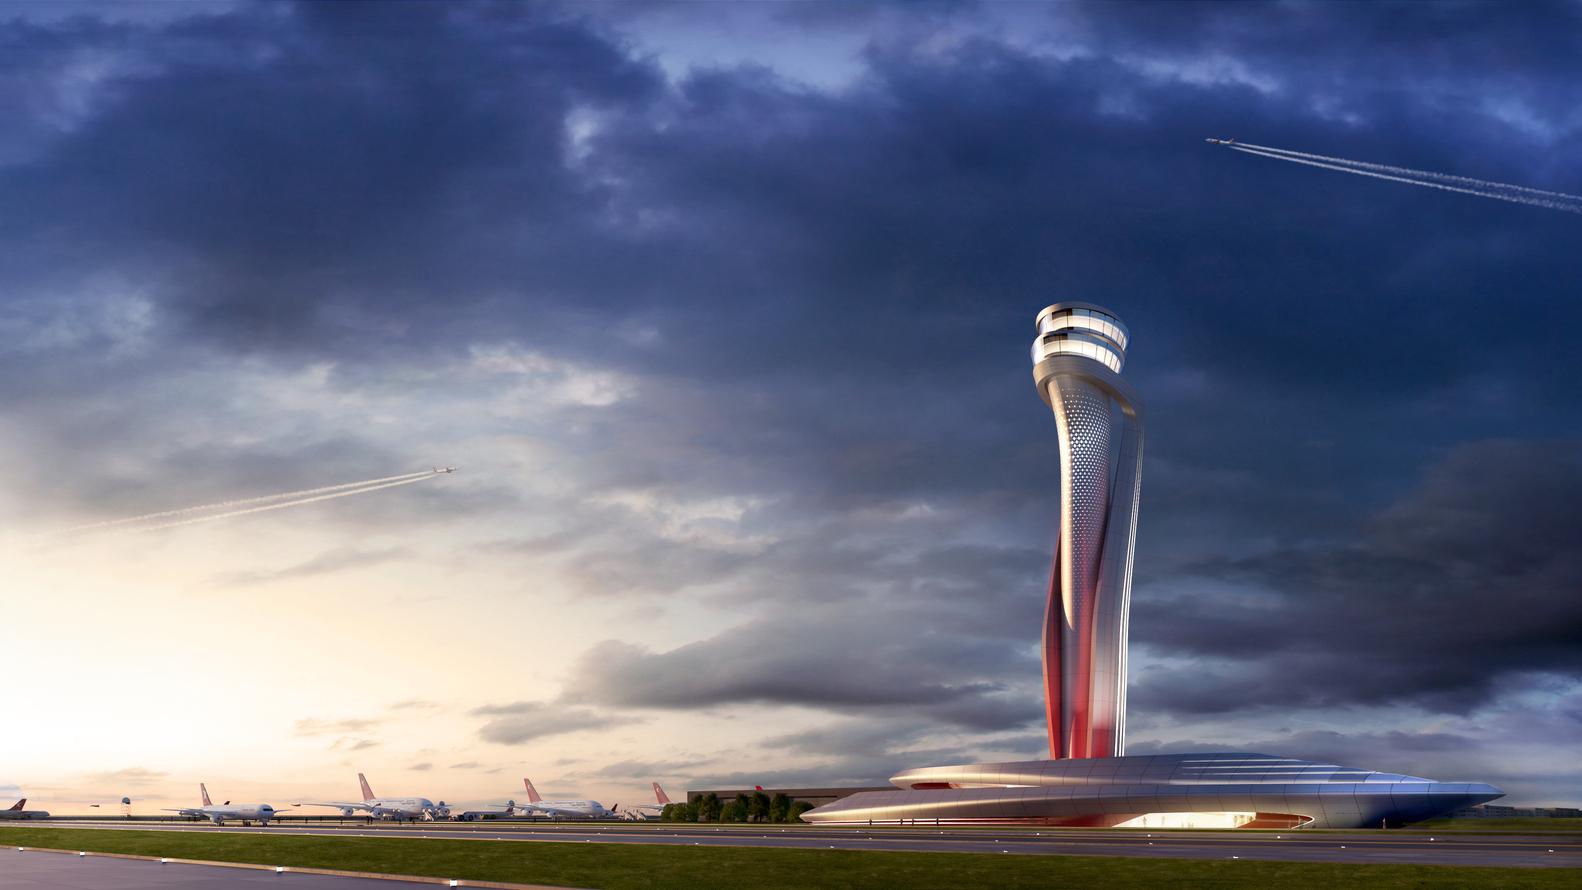 IGA_Istanbul_Yeni-Havalimani_ATC_Kule_Tasarim_yarisma_Lale_Aecom_Dec-2015_002